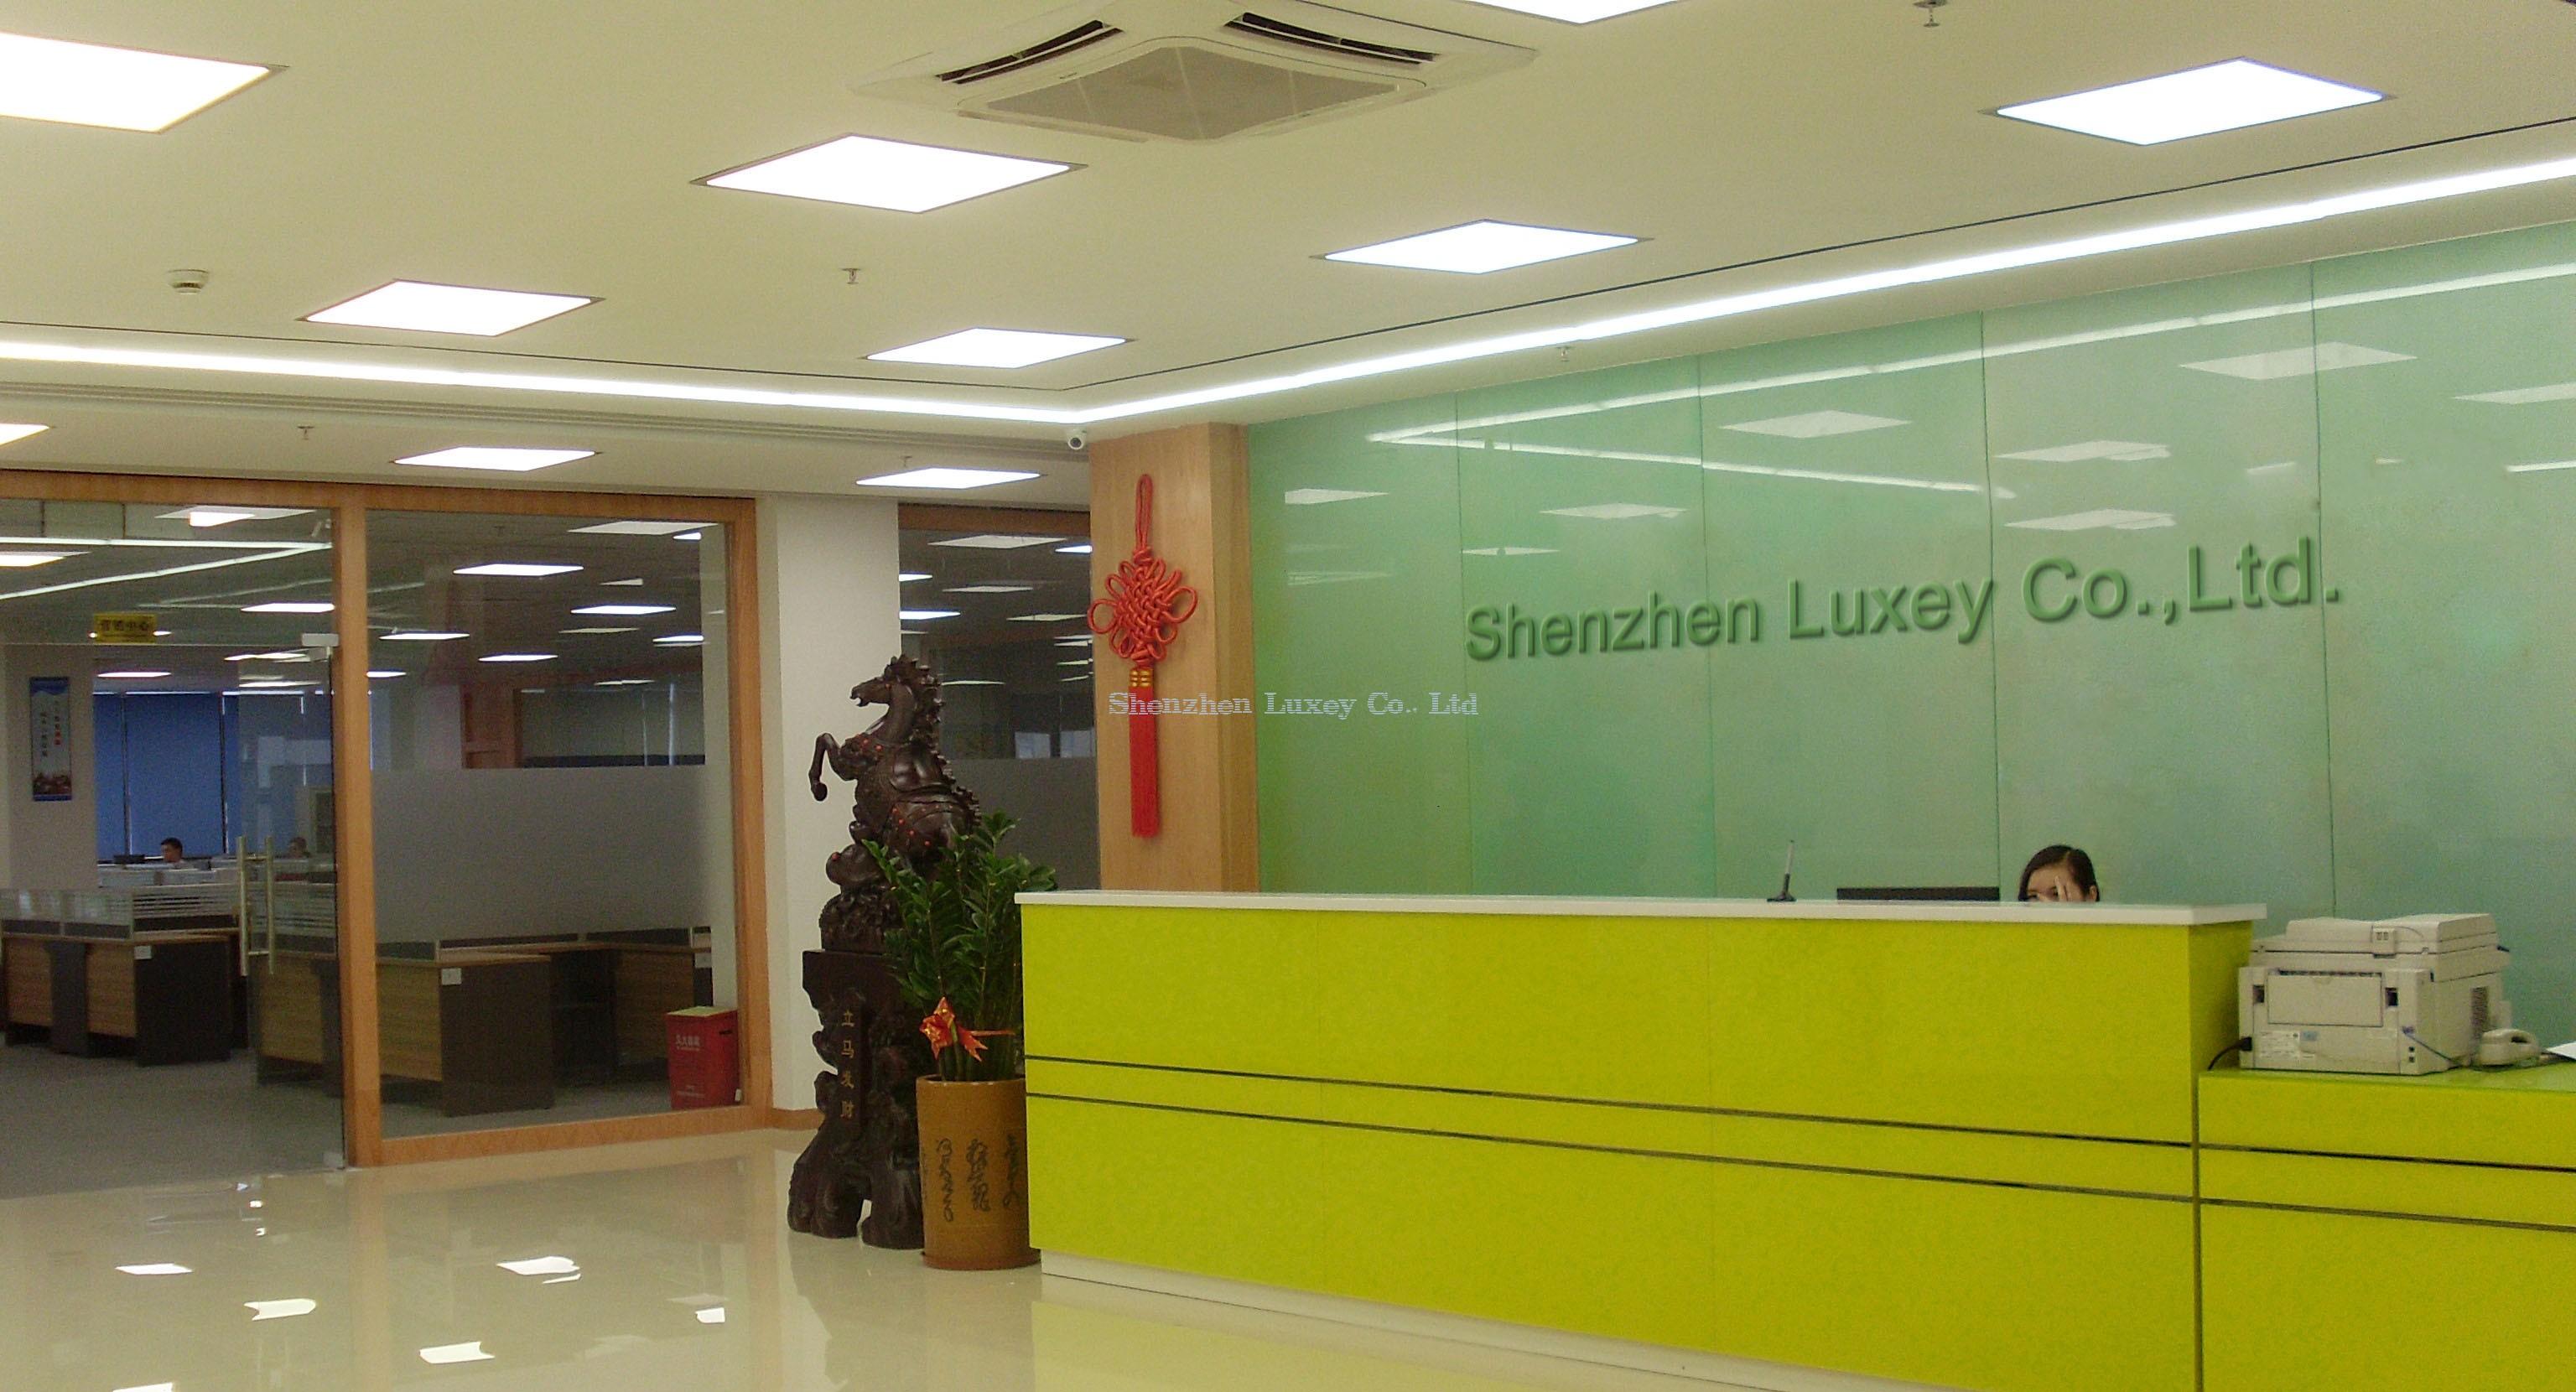 Shenzhen Luxey LED Lighting